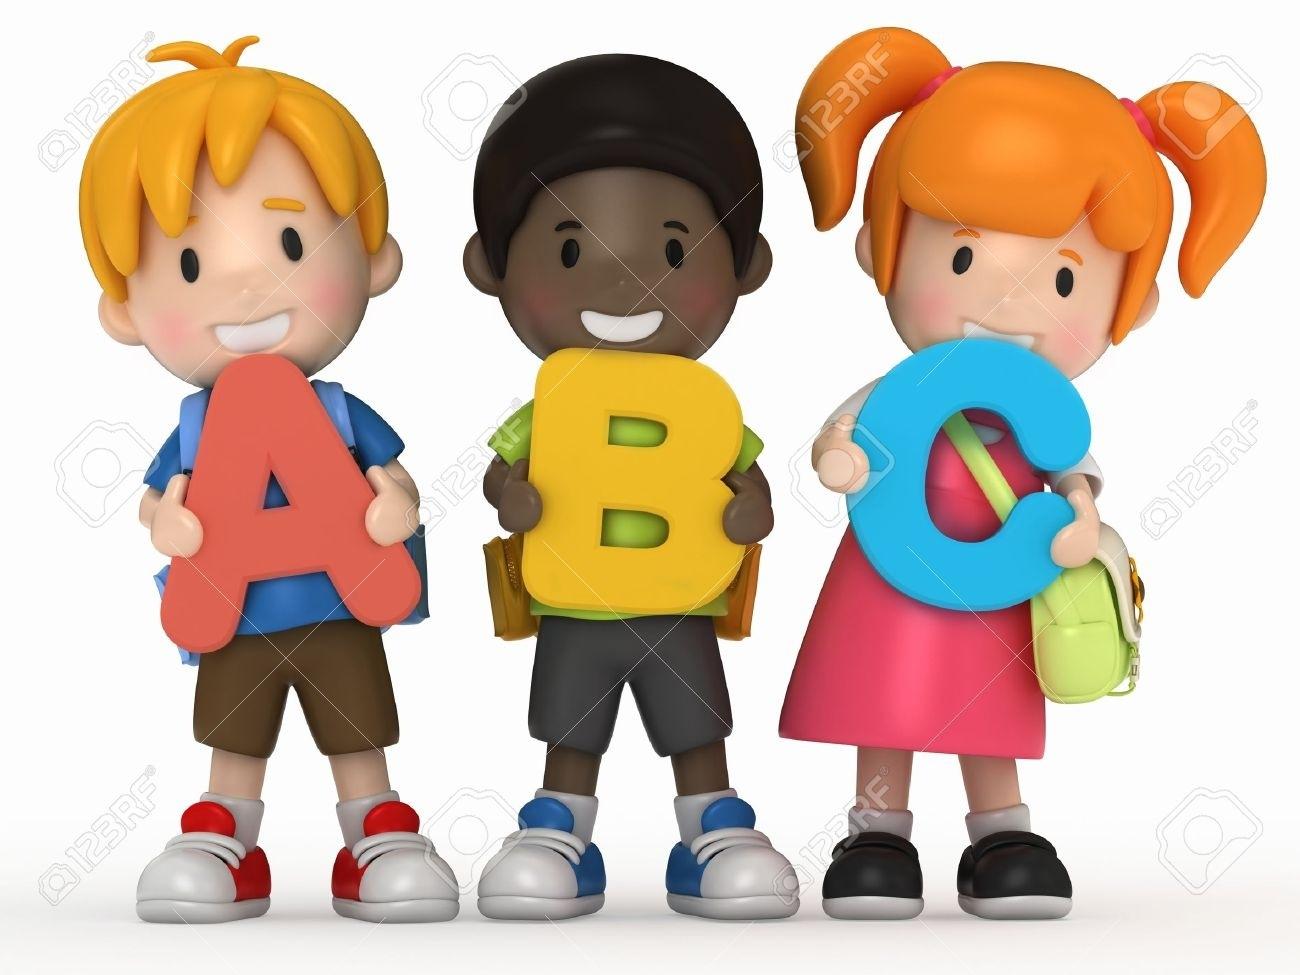 Abc clipart nursery school. Kids learning kind of